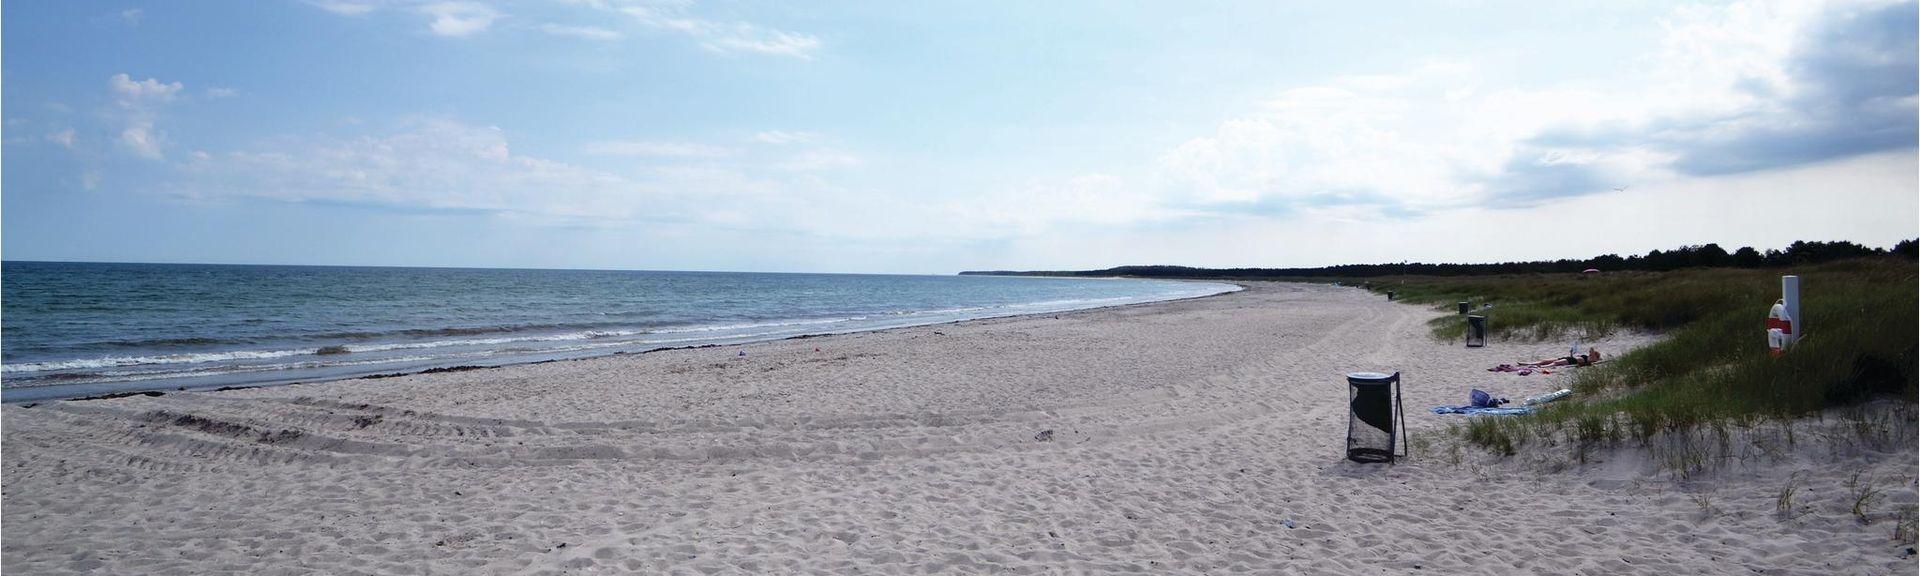 Grenå Strand, Grenaa, Region Midtjylland, Danmark